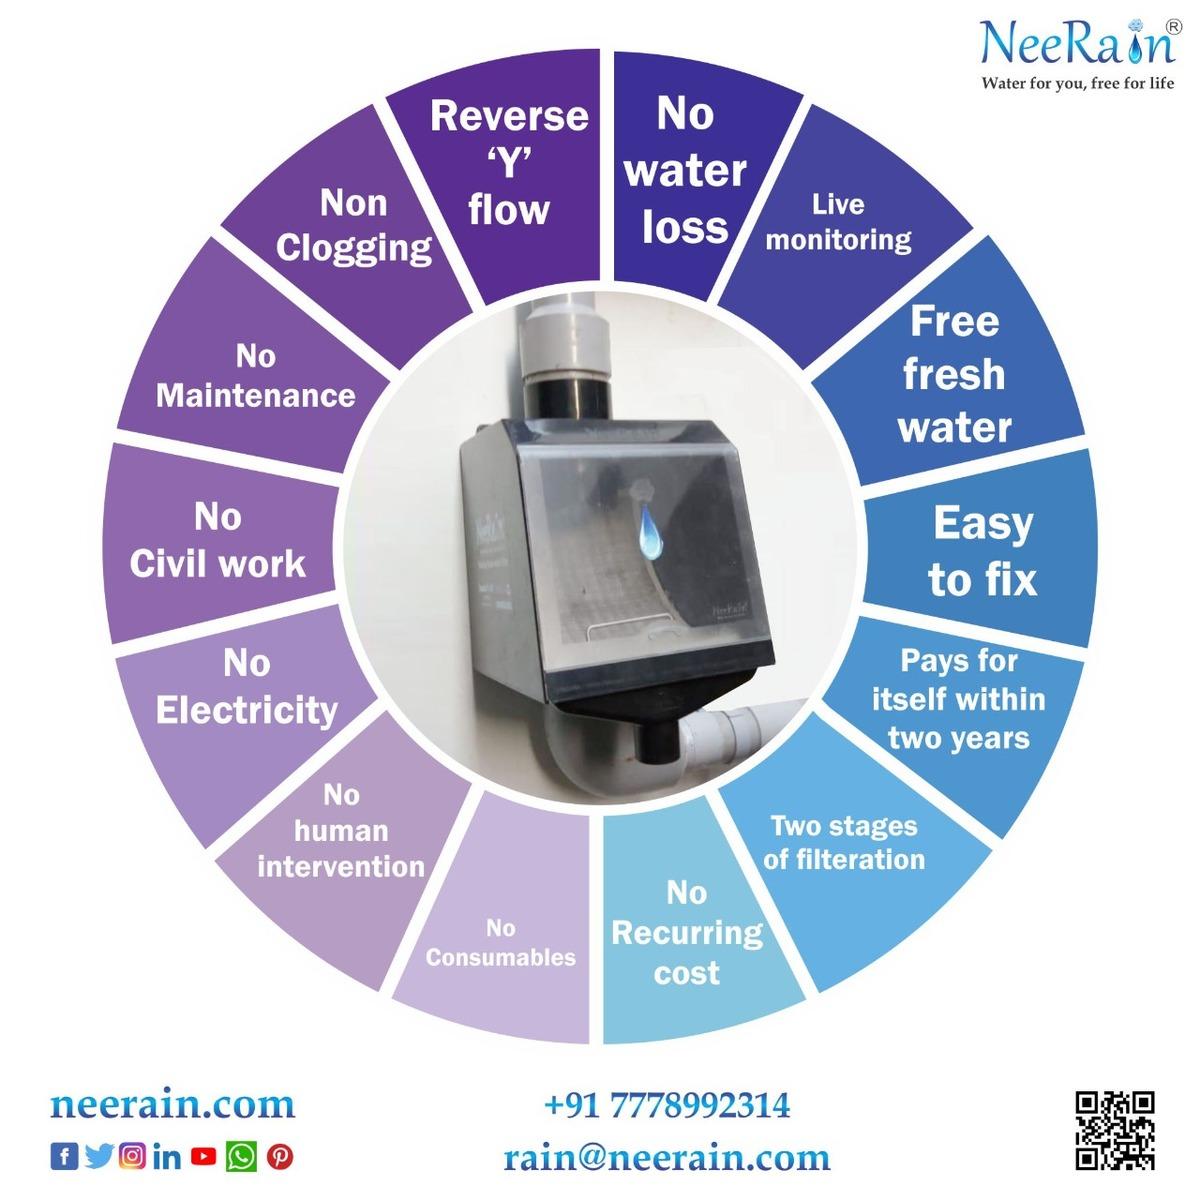 NeeRain Rainwater Filter